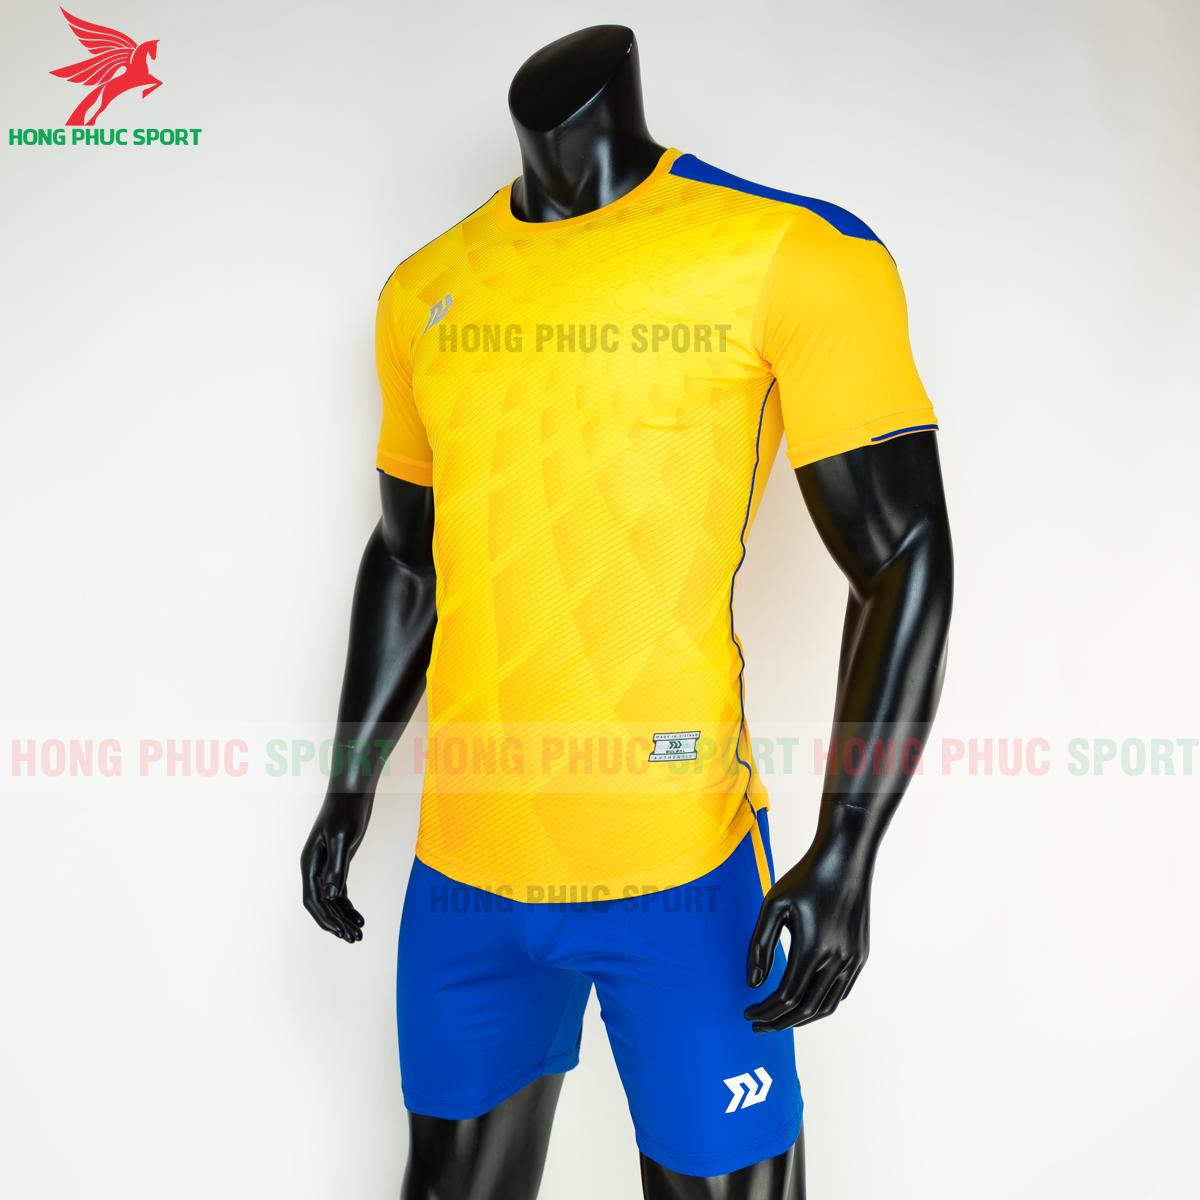 https://cdn.hongphucsport.com/unsafe/s4.shopbay.vn/files/285/ao-bong-da-khong-logo-bulbal-lotus-mau-vang-6-60500ef580609.png